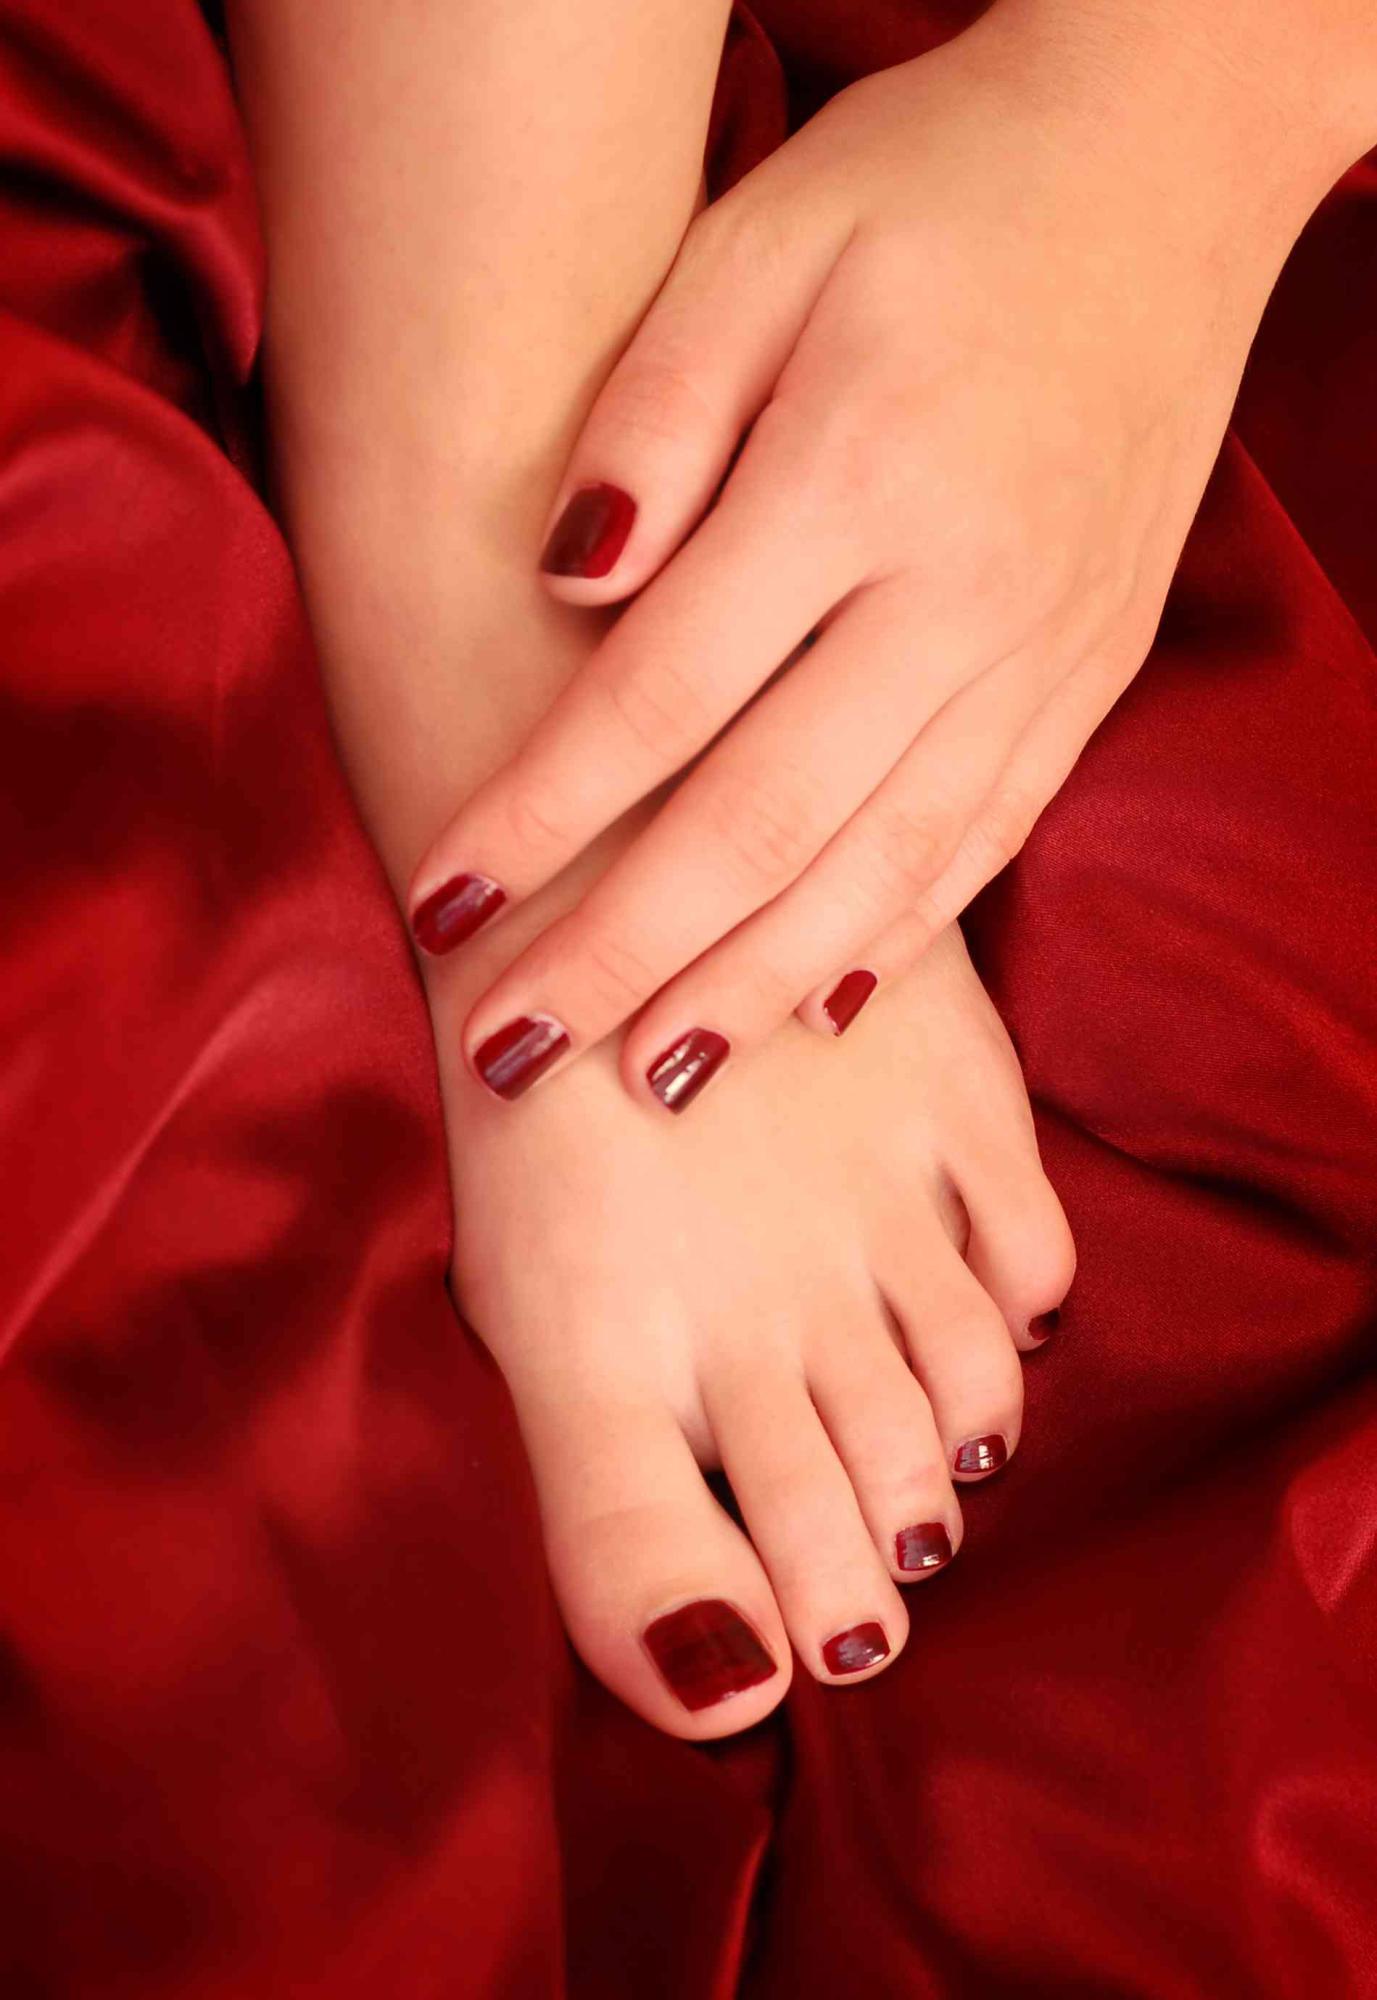 Skin Care, Facials, Pedicures, Waxing, Nail Salon